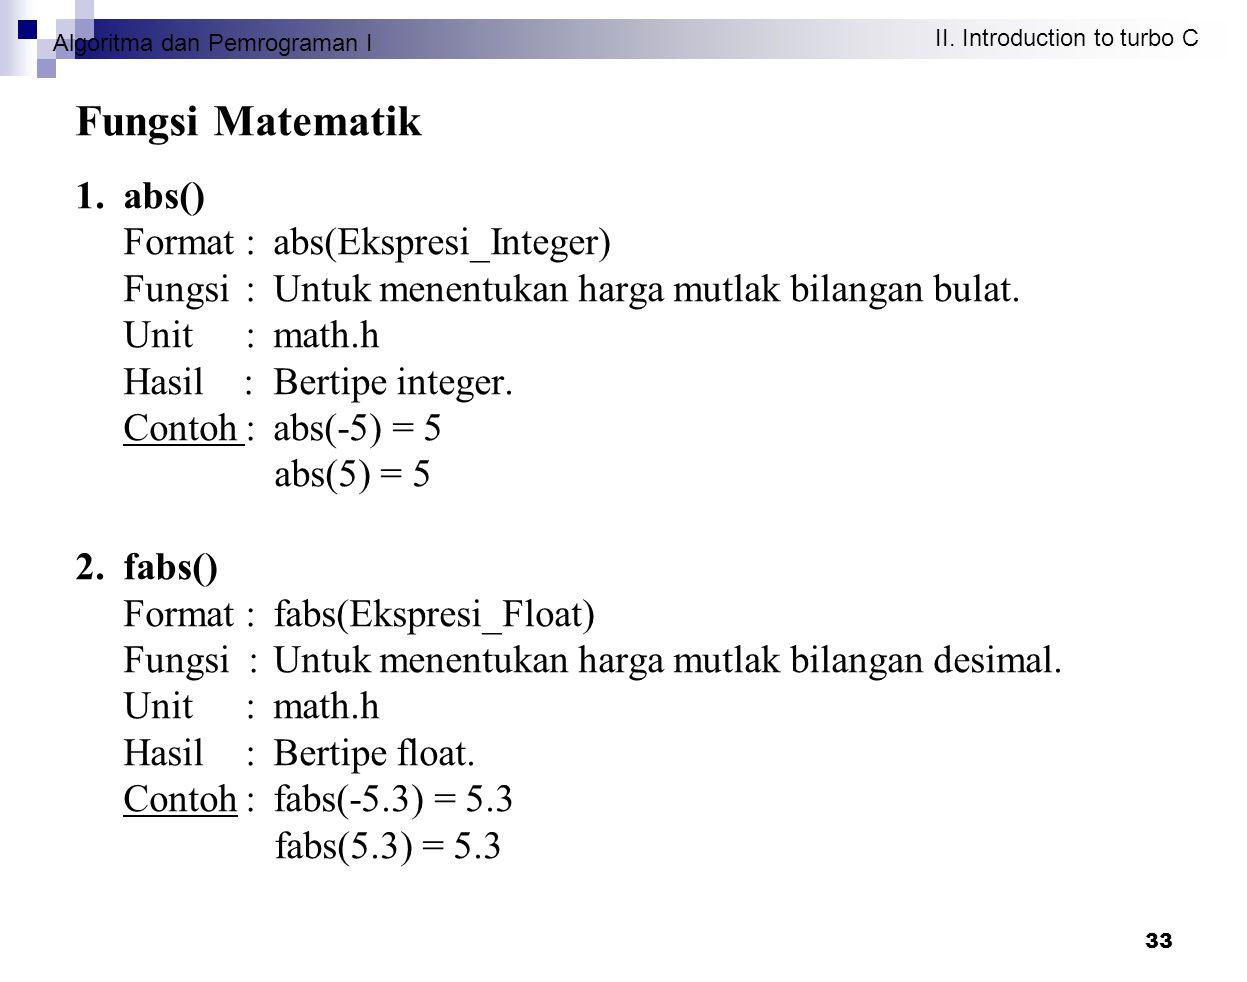 Algoritma dan Pemrograman I II. Introduction to turbo C 33 Fungsi Matematik 1. abs() Format: abs(Ekspresi_Integer) Fungsi : Untuk menentukan harga mut